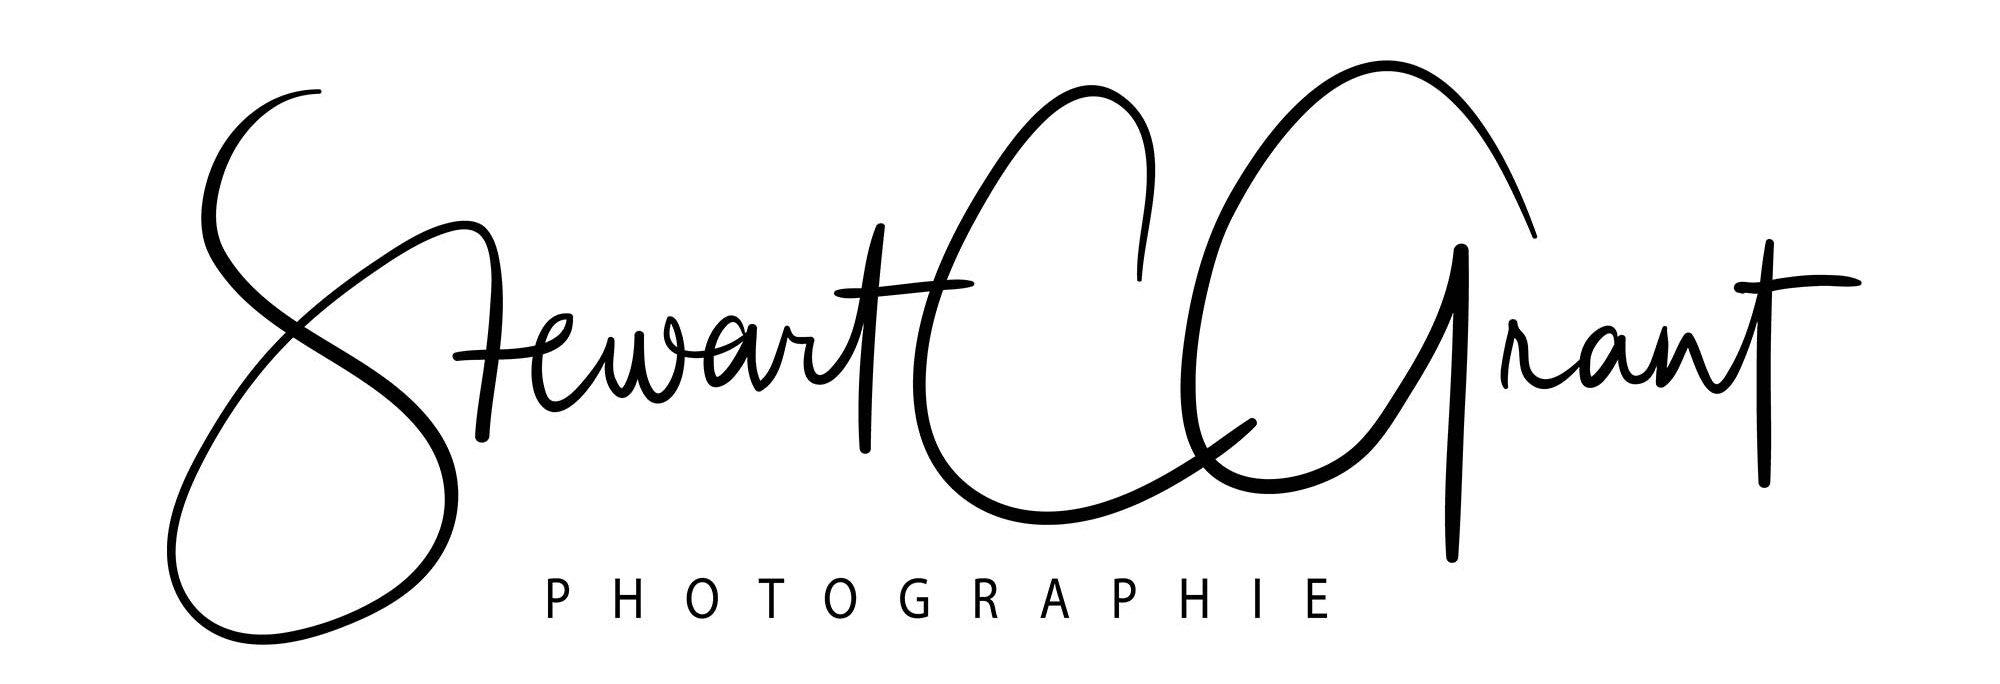 Grant Photographie